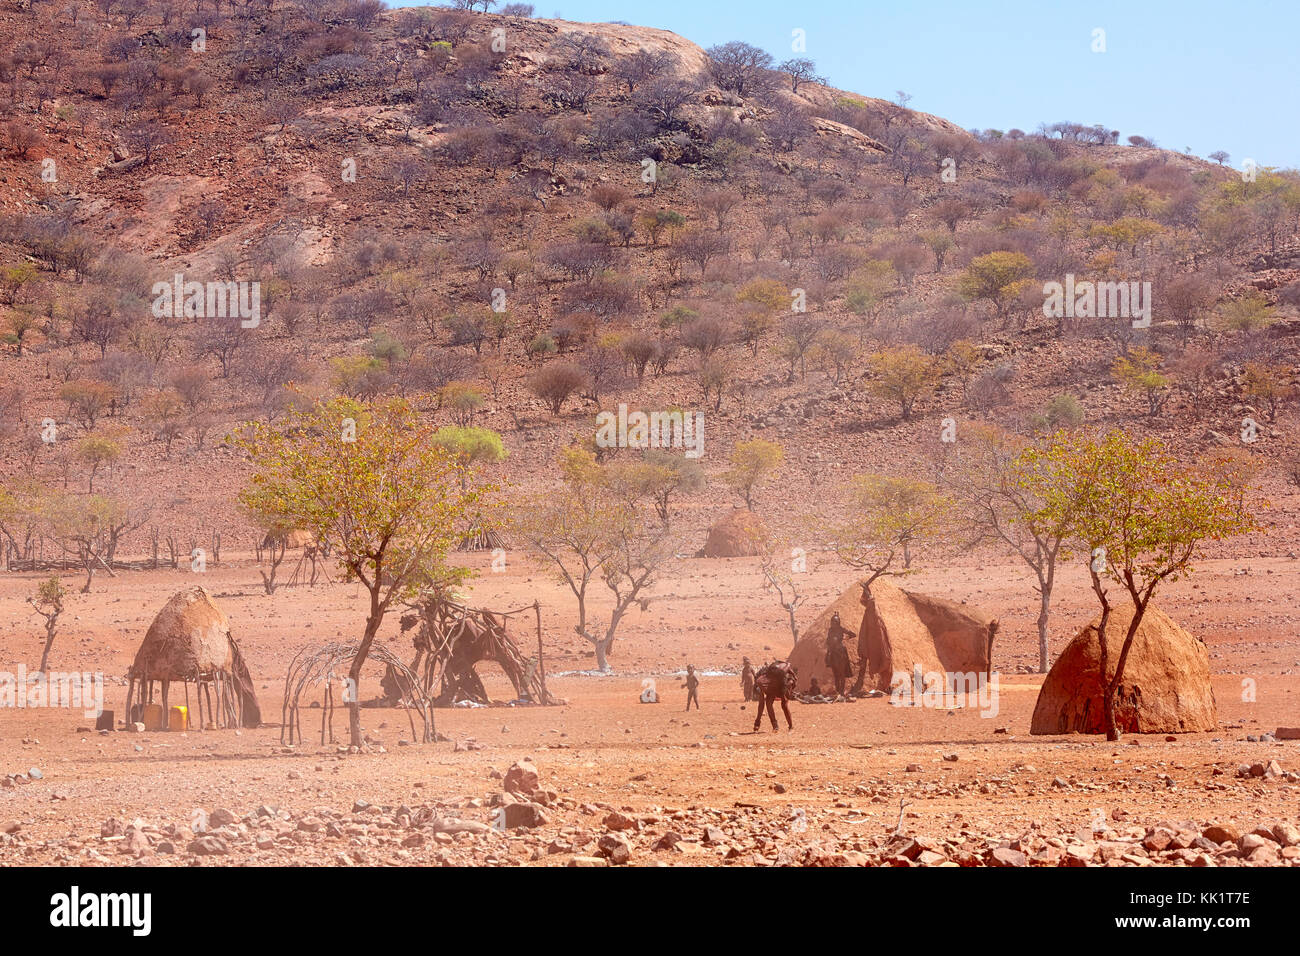 Traditional himba village near Epupa Falls, Kaokoveld, Namibia, Africa - Stock Image